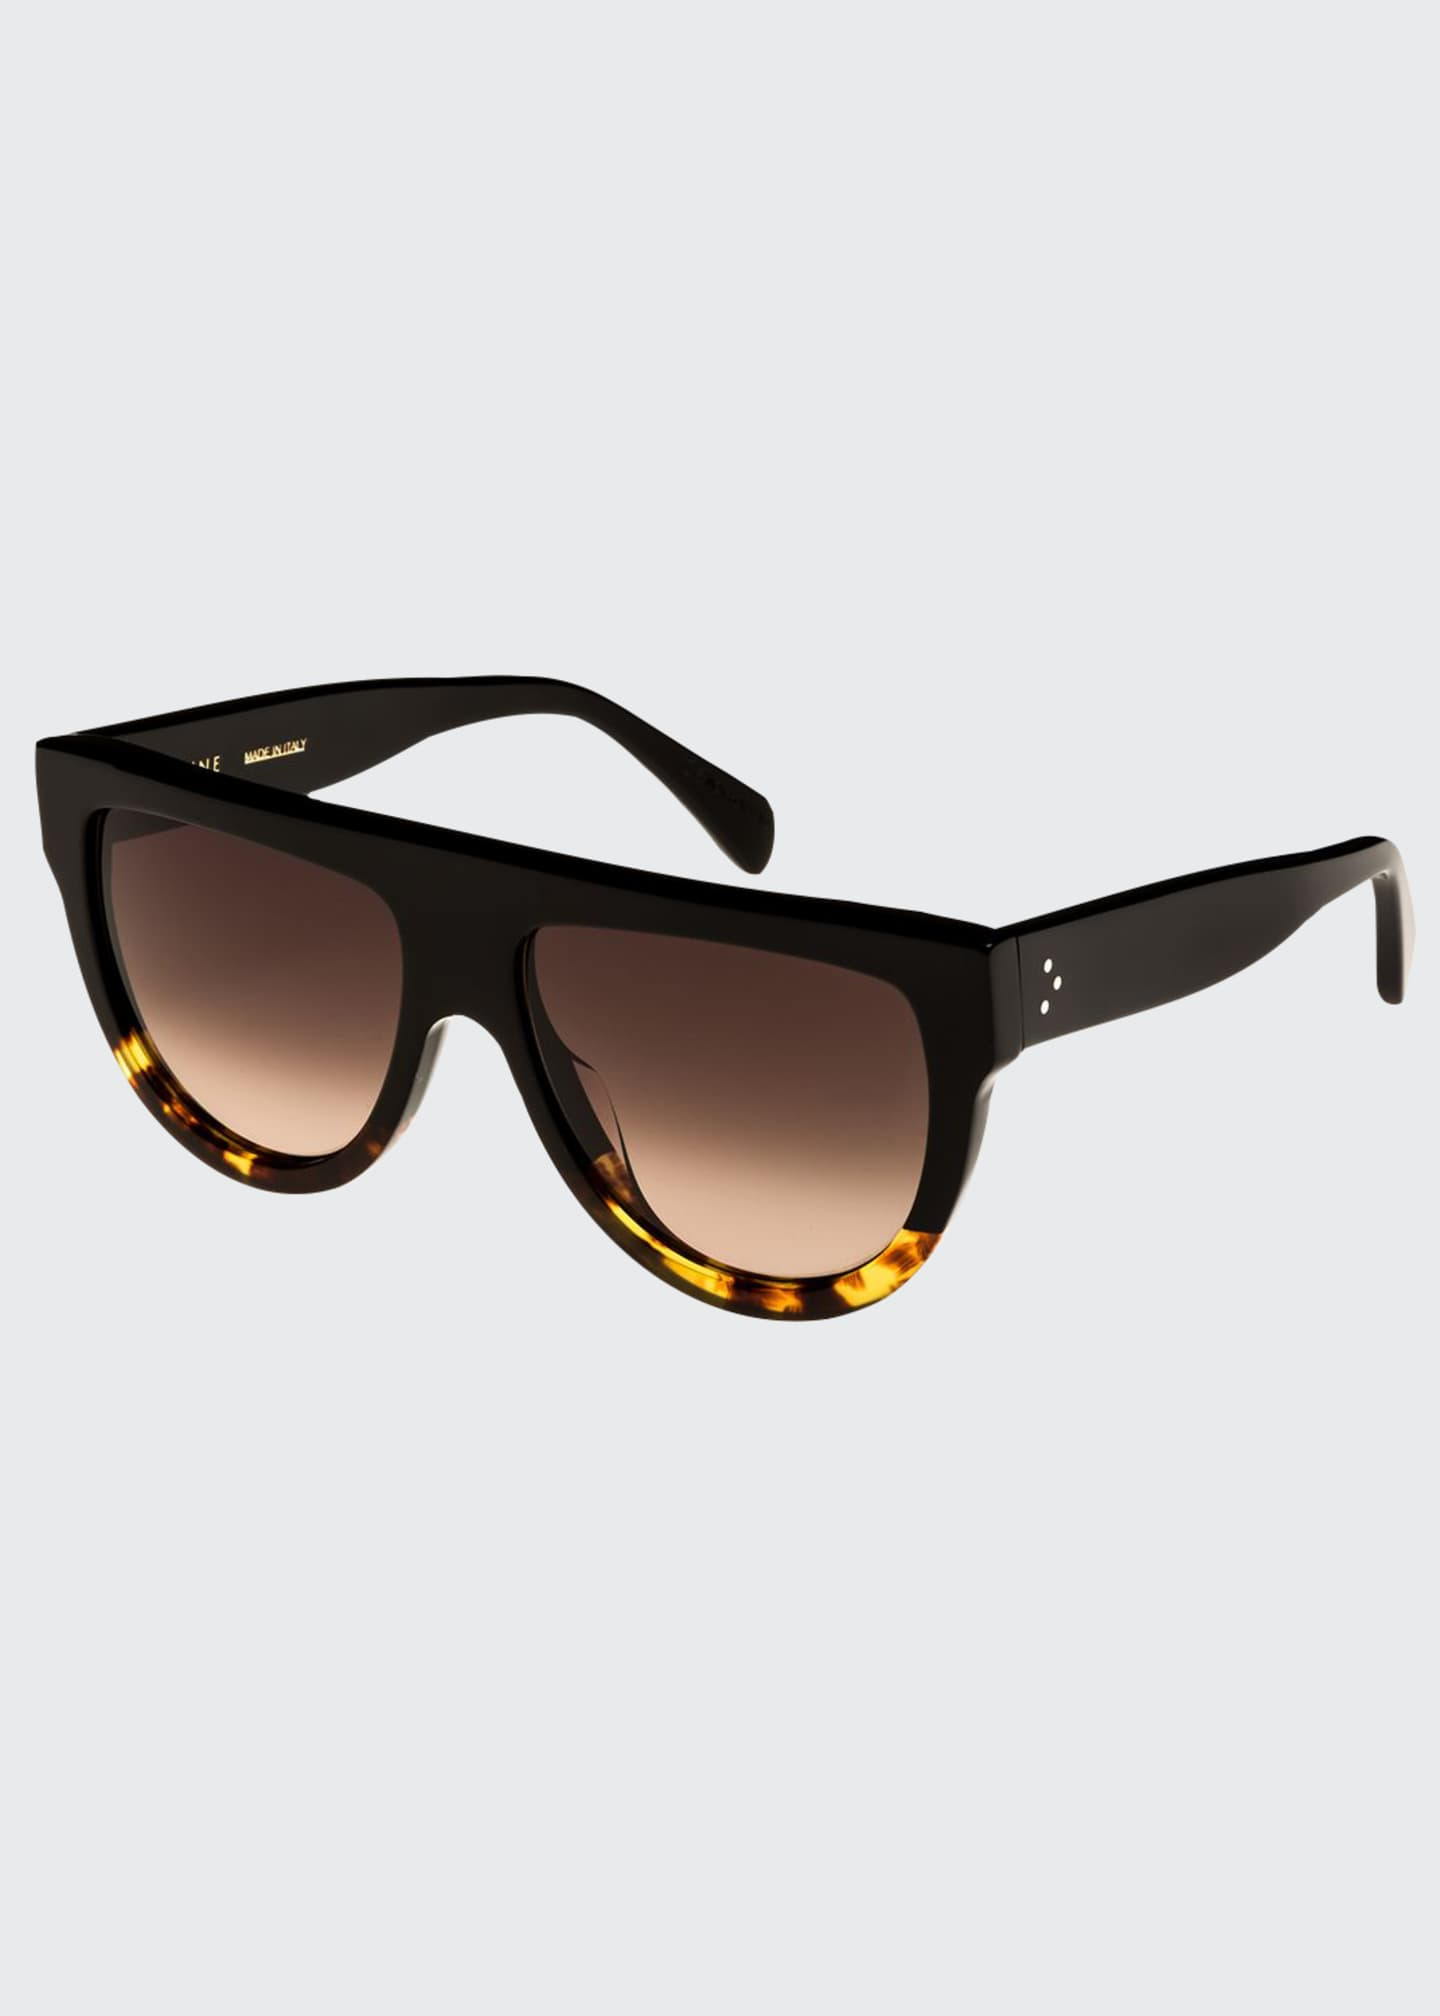 Celine Flattop Two-Tone Shield Sunglasses, Black Pattern